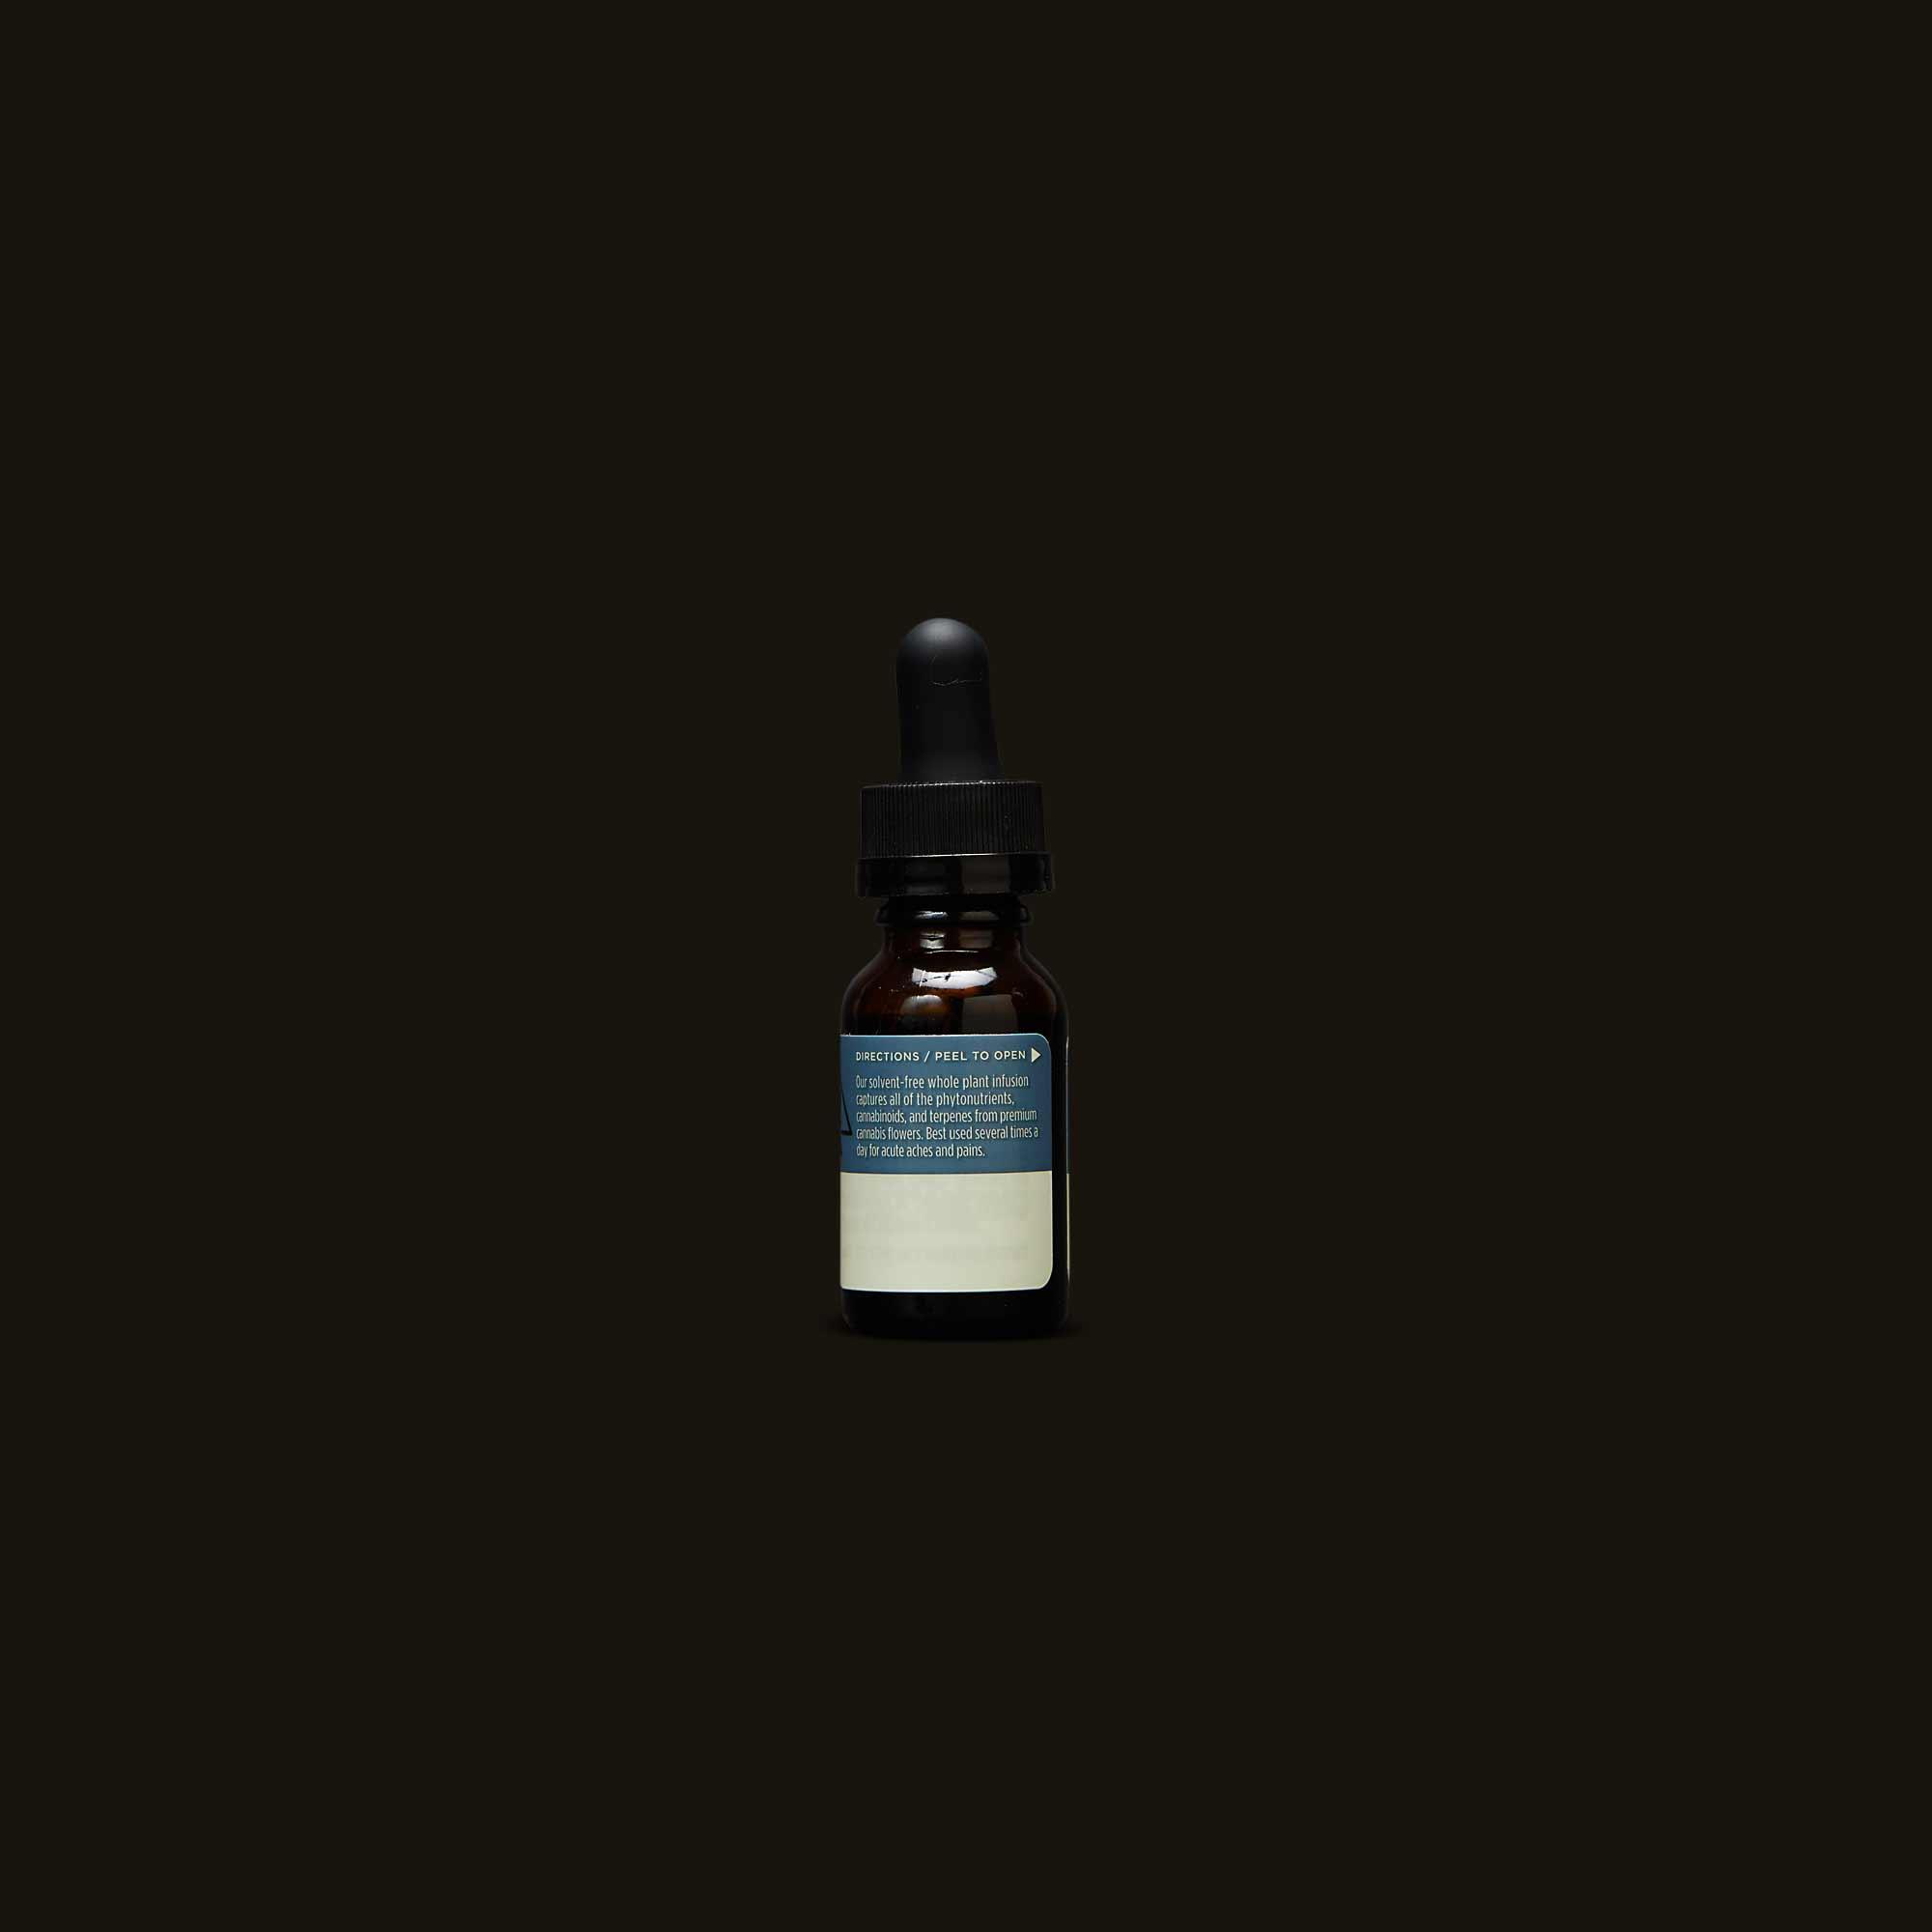 1:3 CBD:THC Releaf Tincture by Papa & Barkley